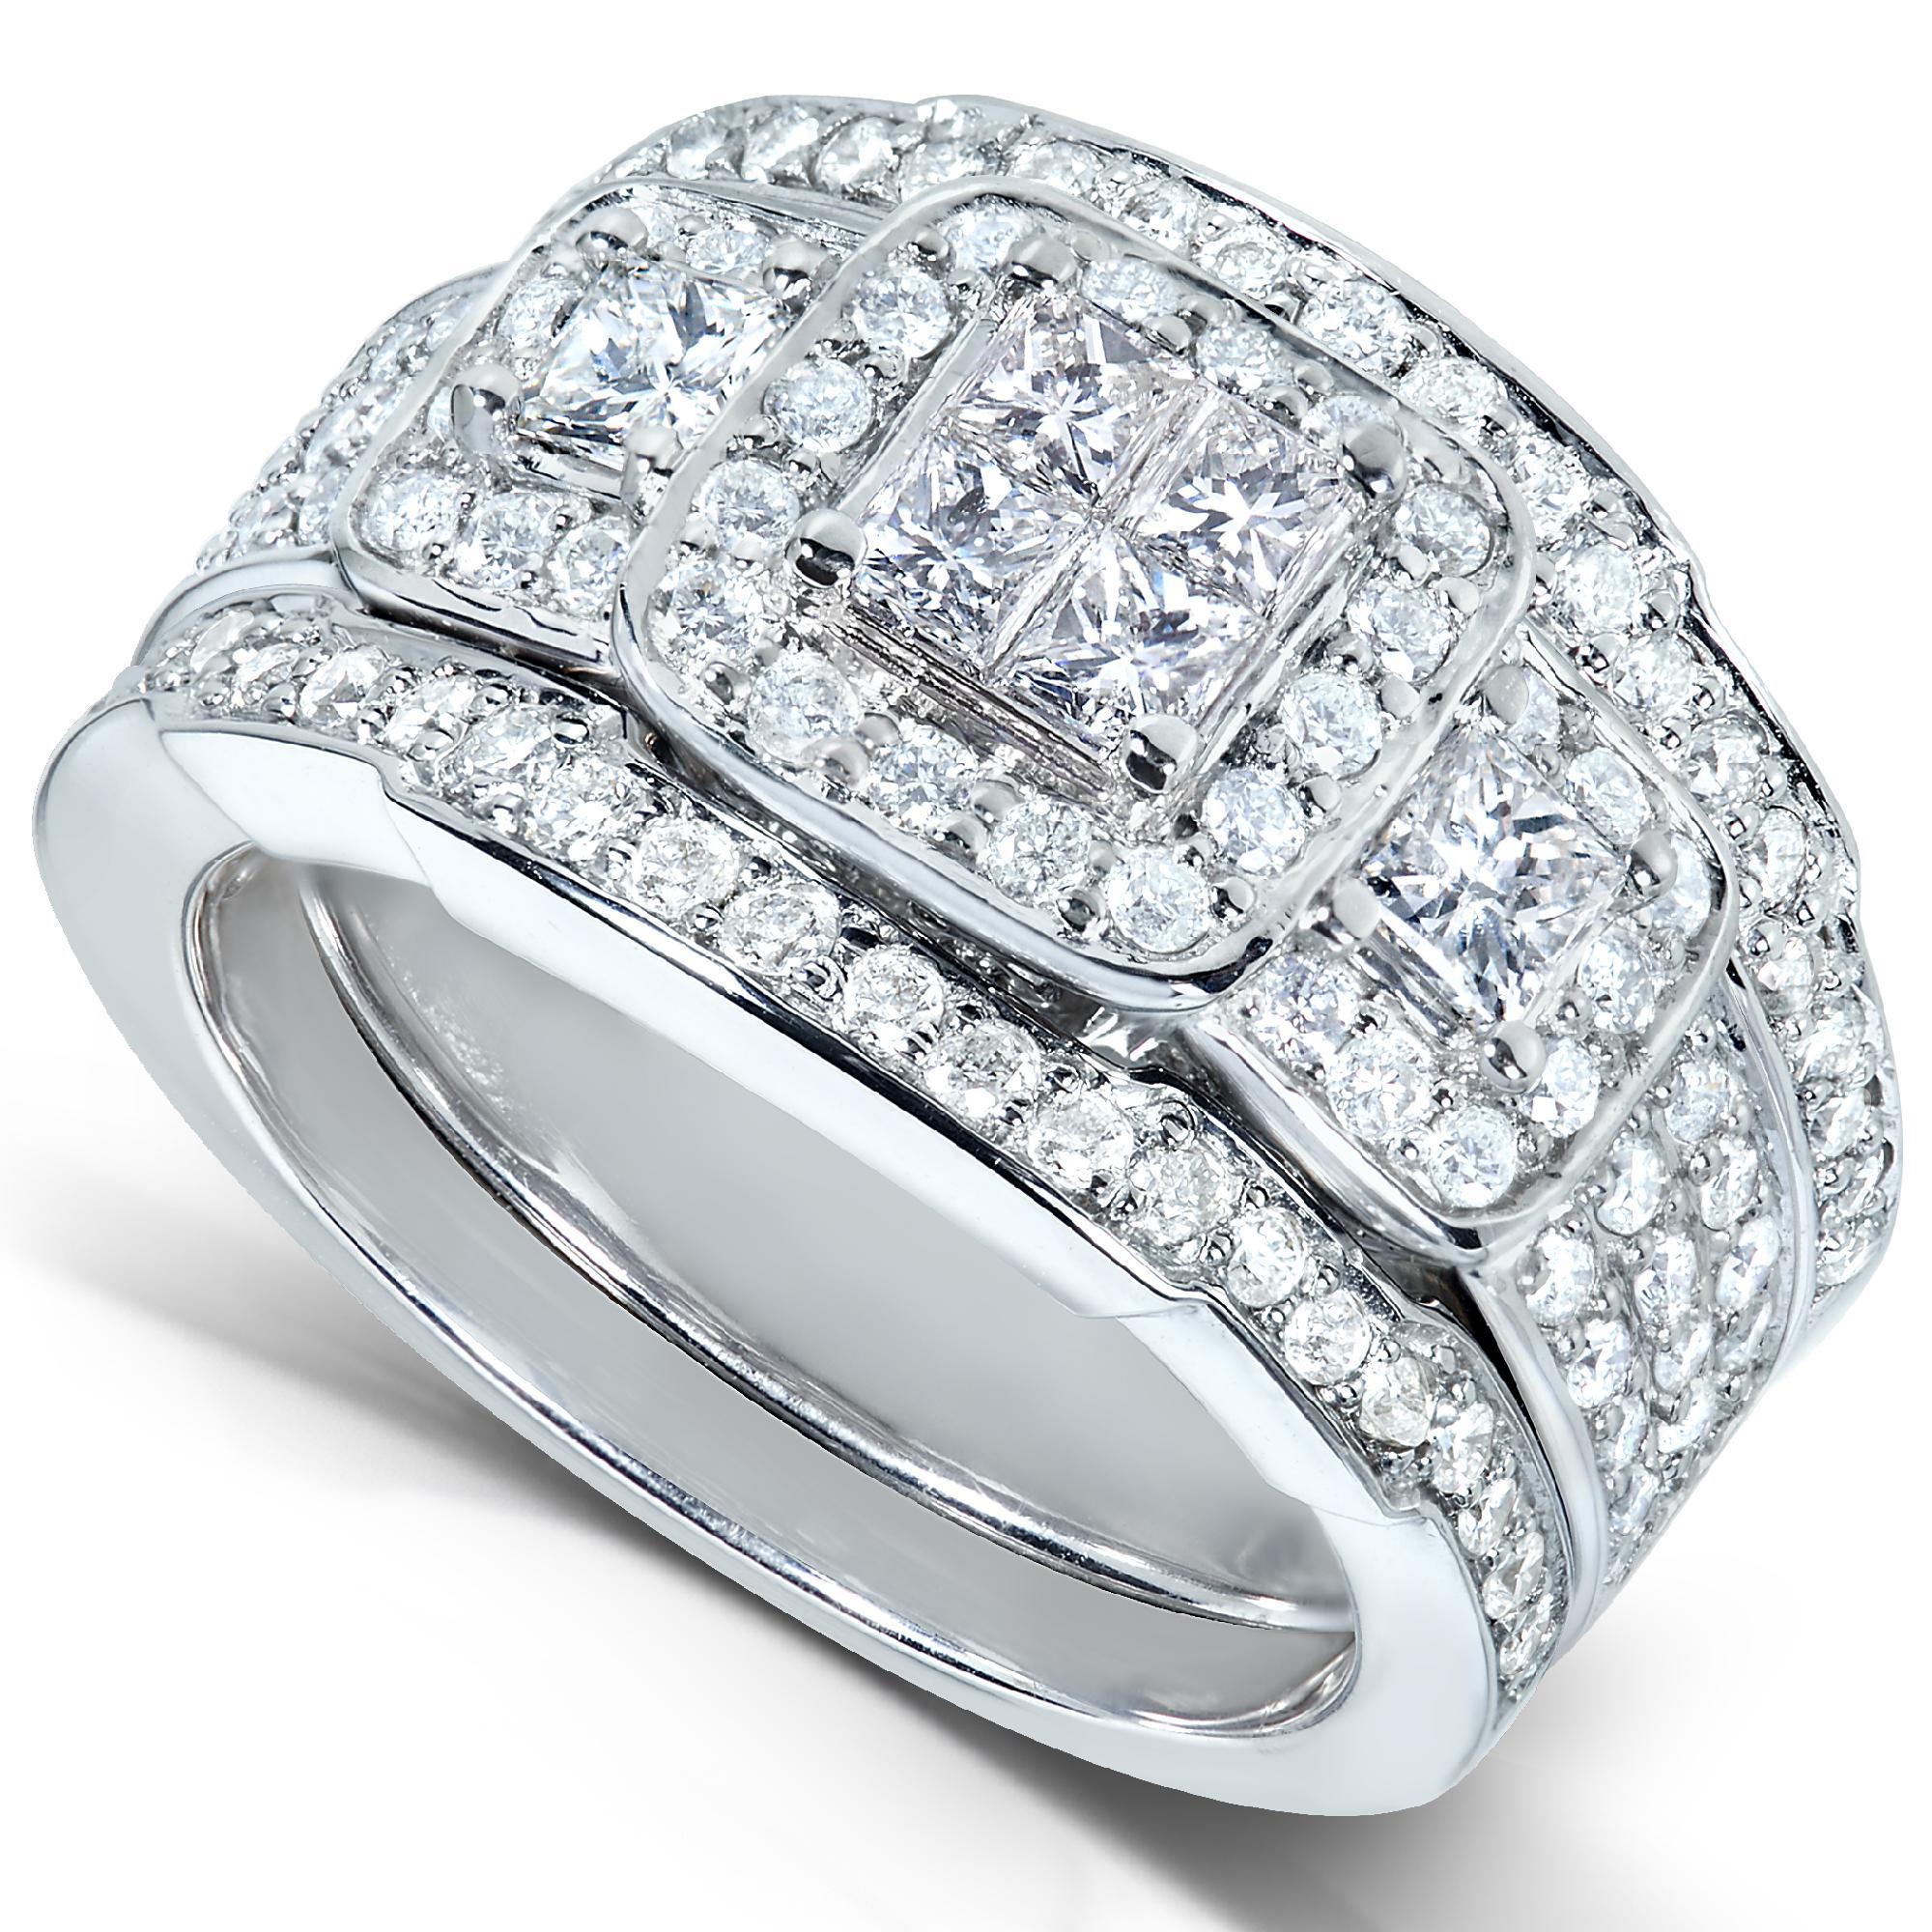 Diamond Me Princess Diamond Wedding Rings Set 1 1 3 Carat Cttw In 14k White Gold 3 Piece Set